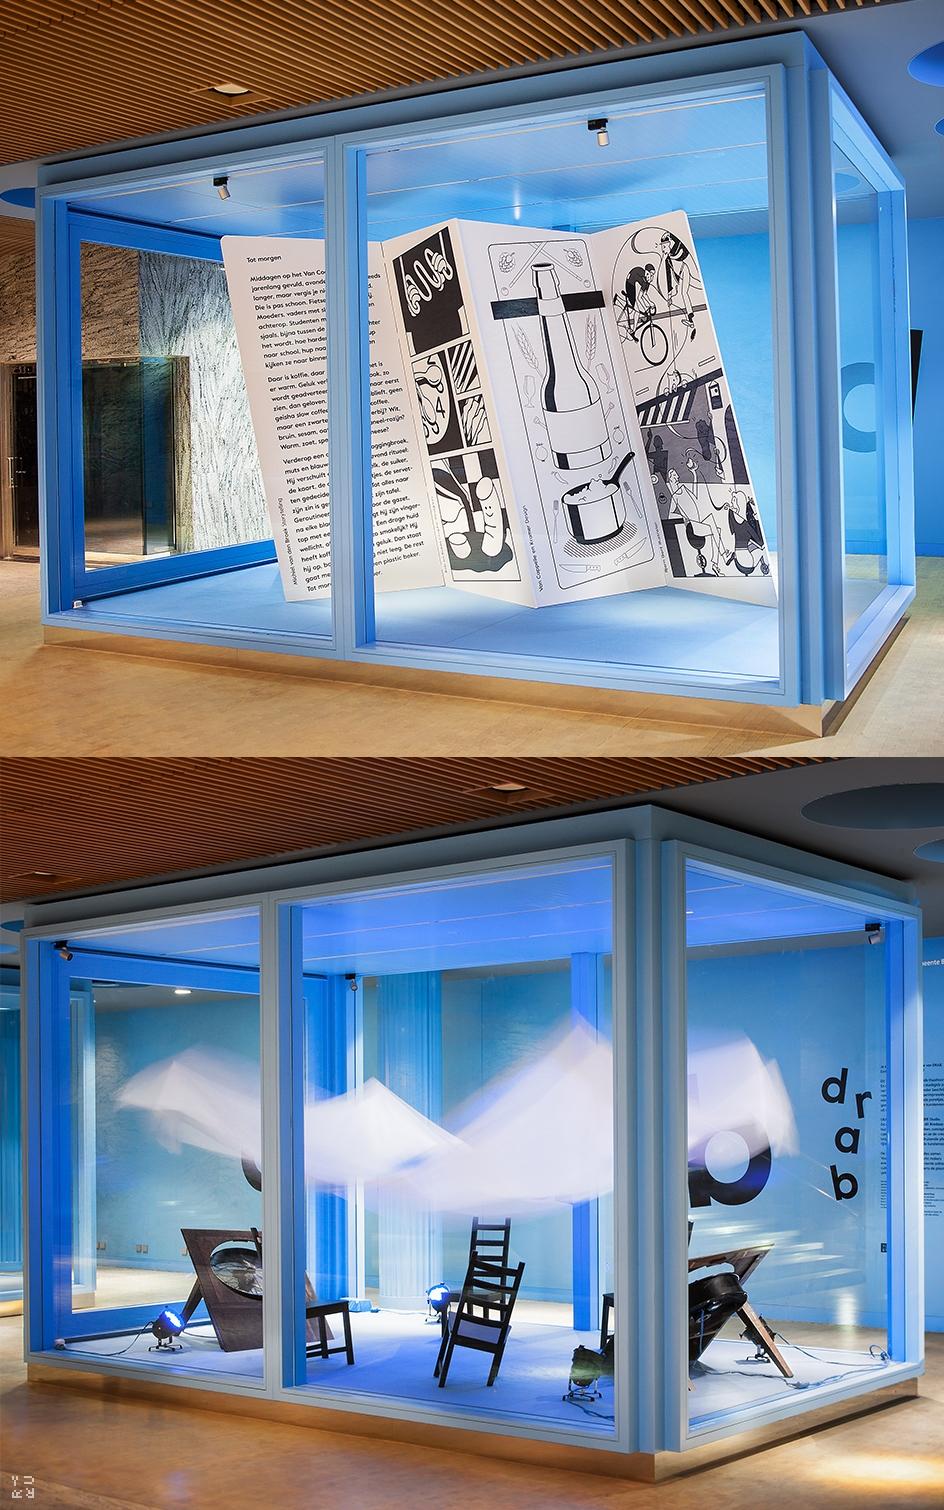 YURR ~ Drab Exhibition - 4, cityguide - yurrstudio | ello